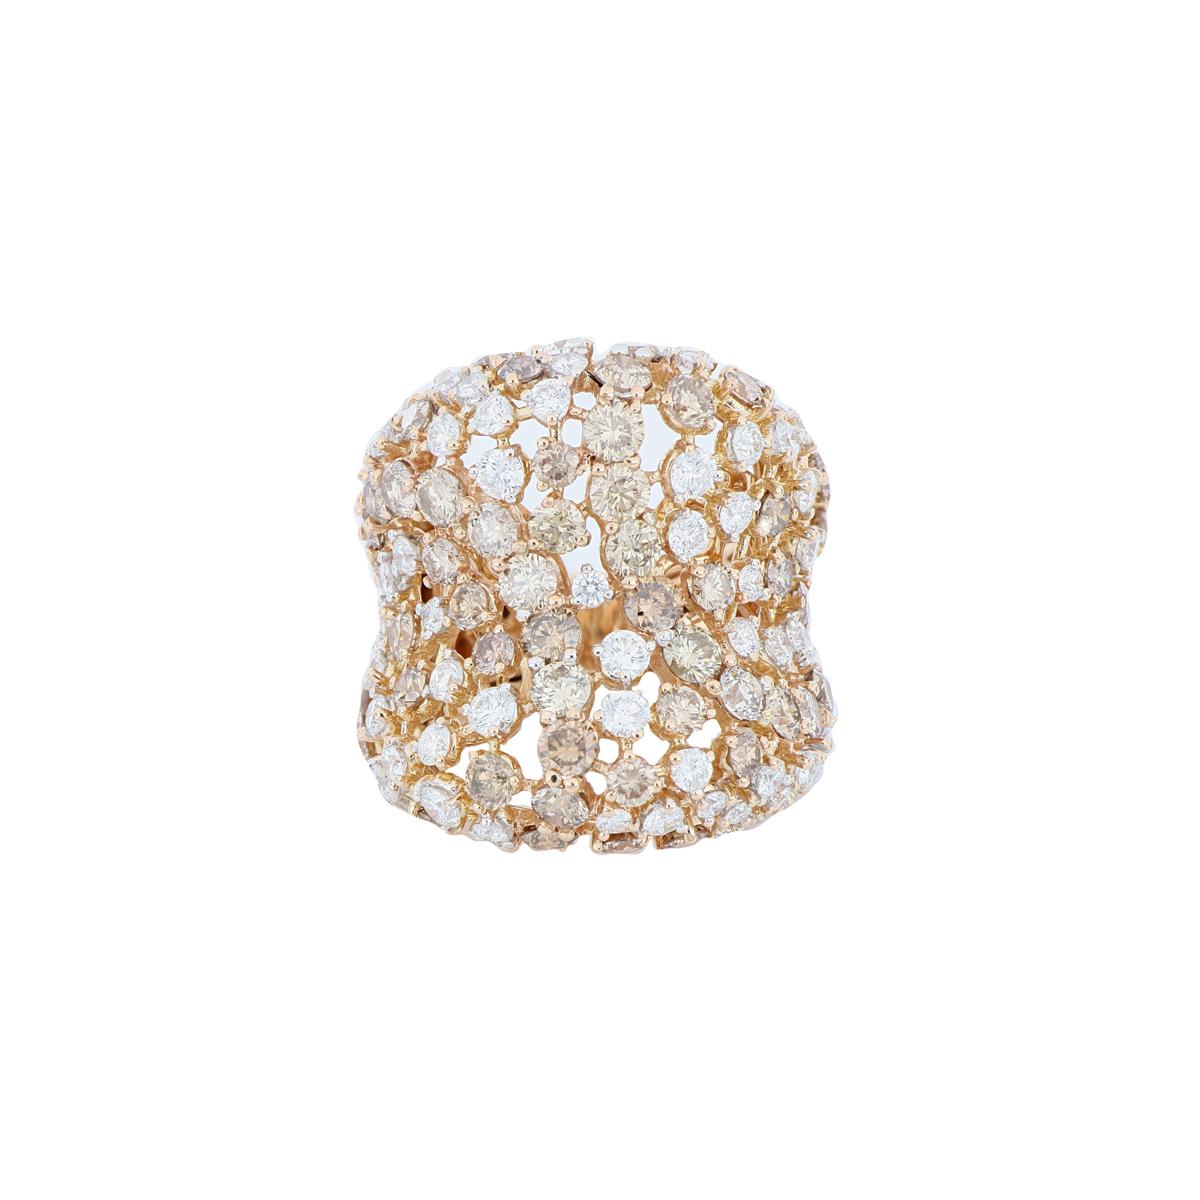 White and Brown Multi-Diamond Fashion Ring